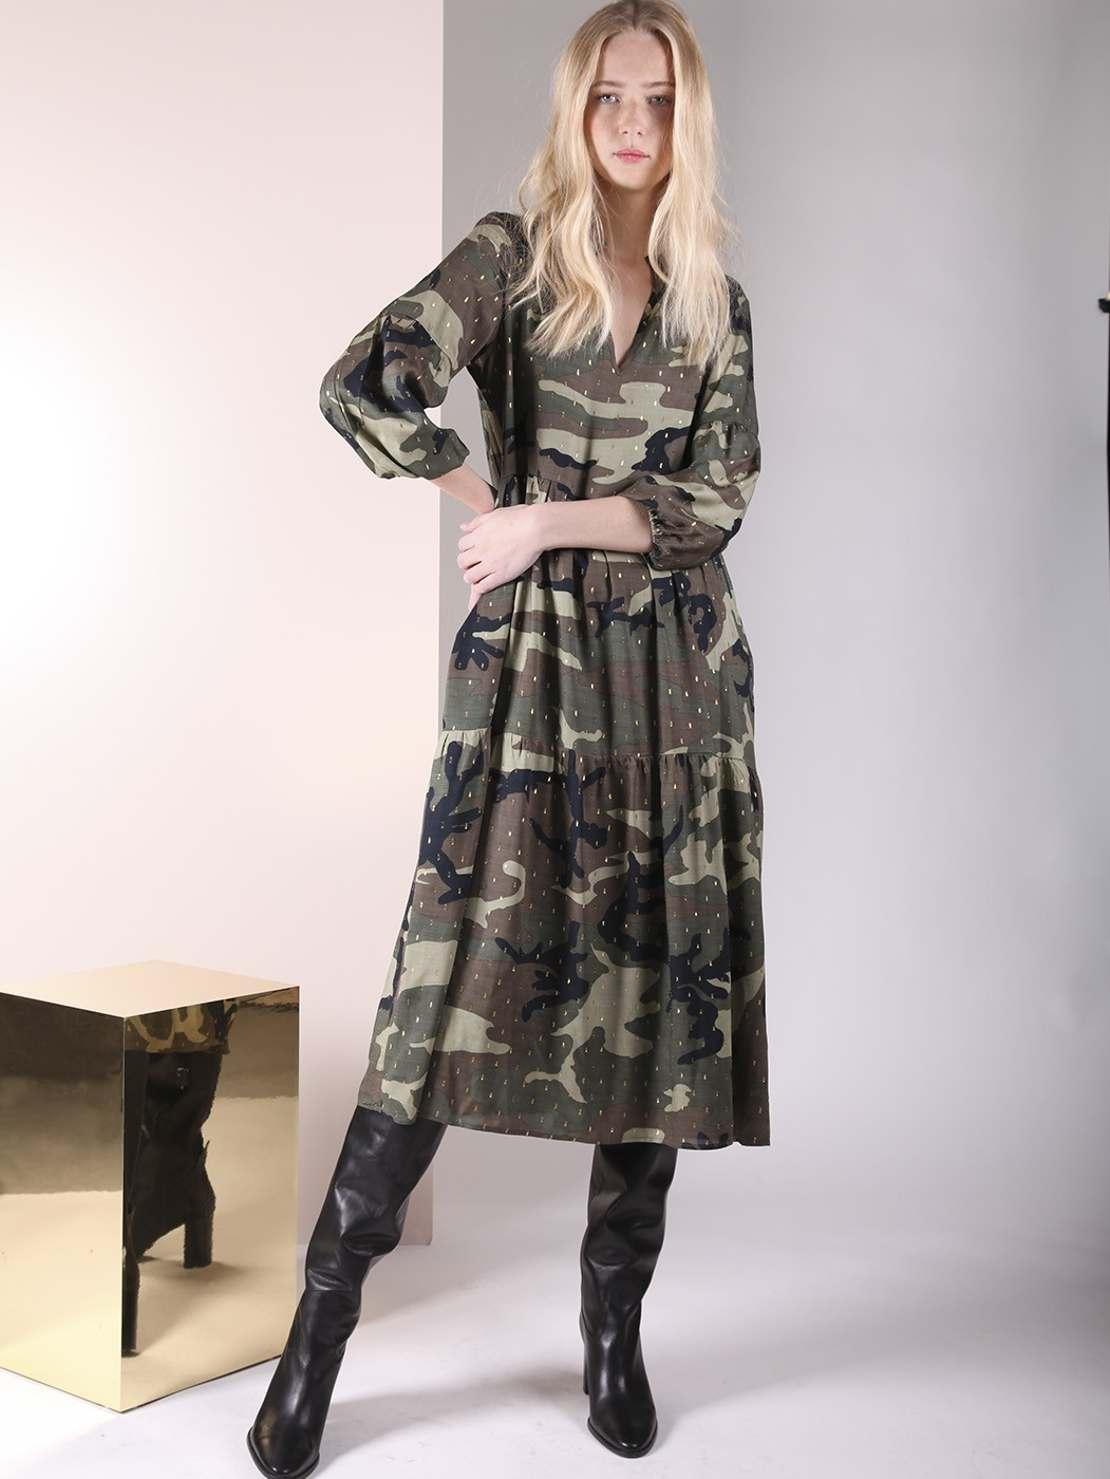 Autumn 21 womenswear at Restoration Yard Pom Amsterdam